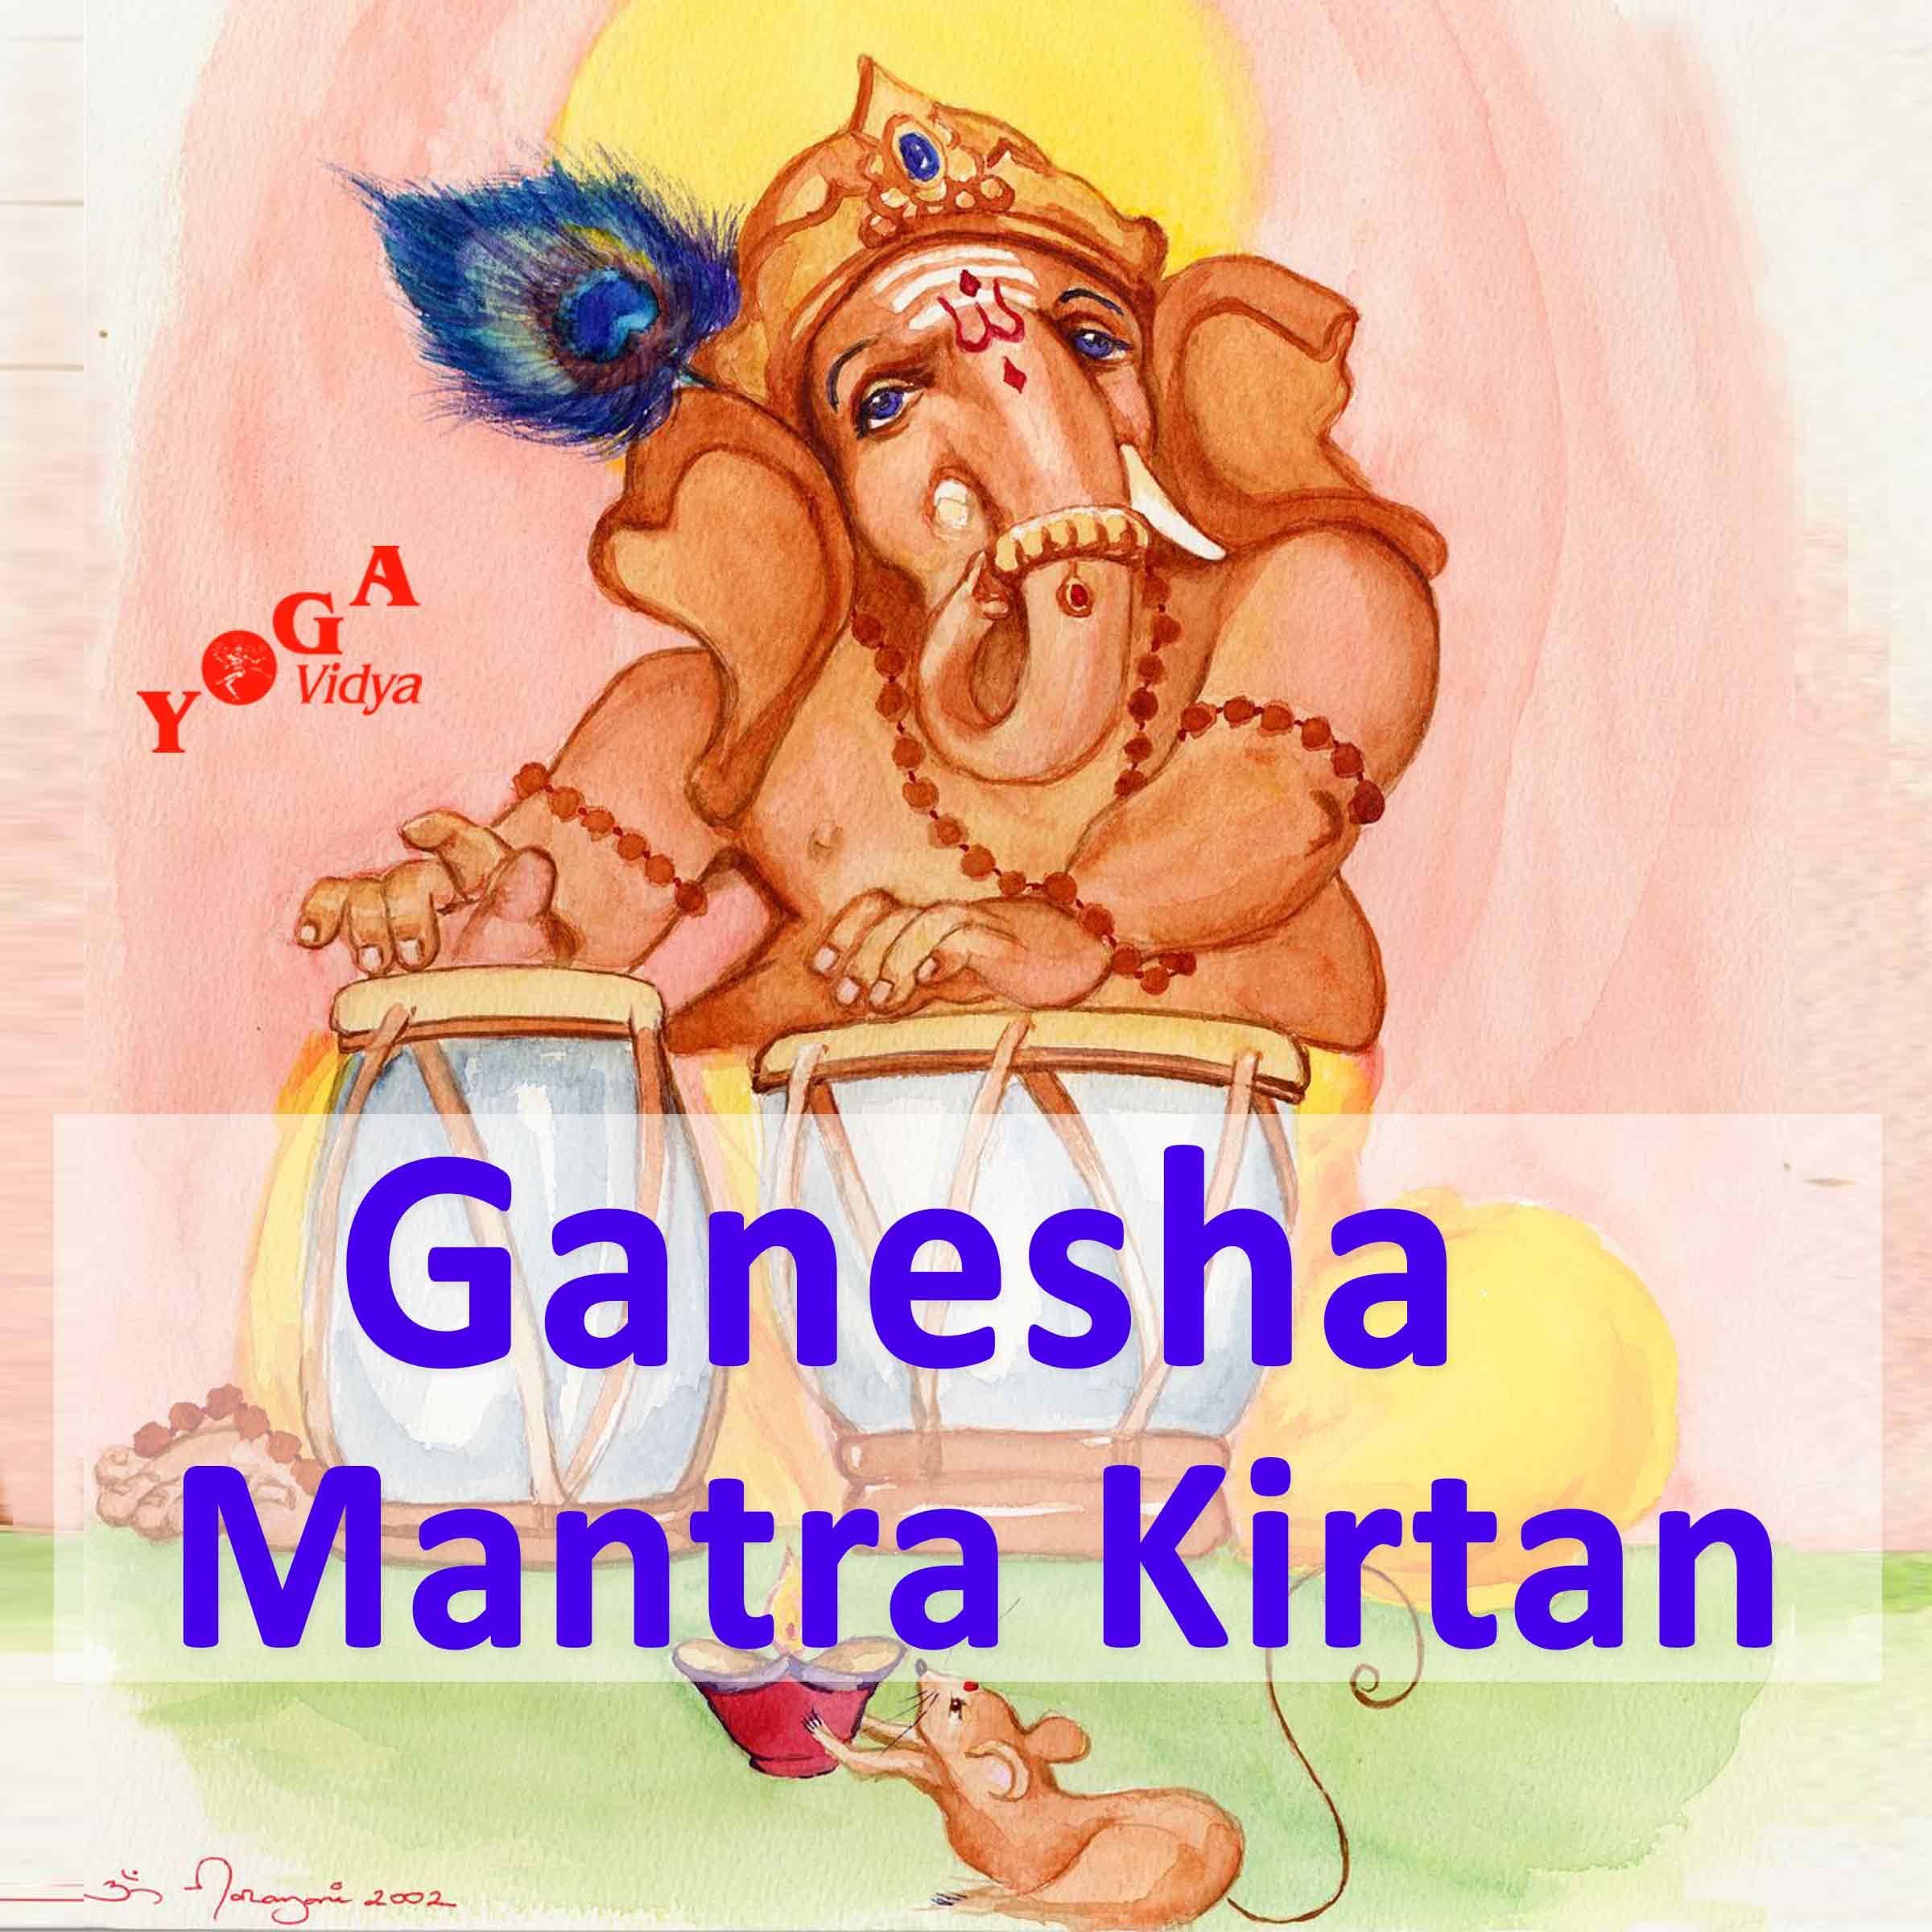 Ganesha Mantra and Kirtan